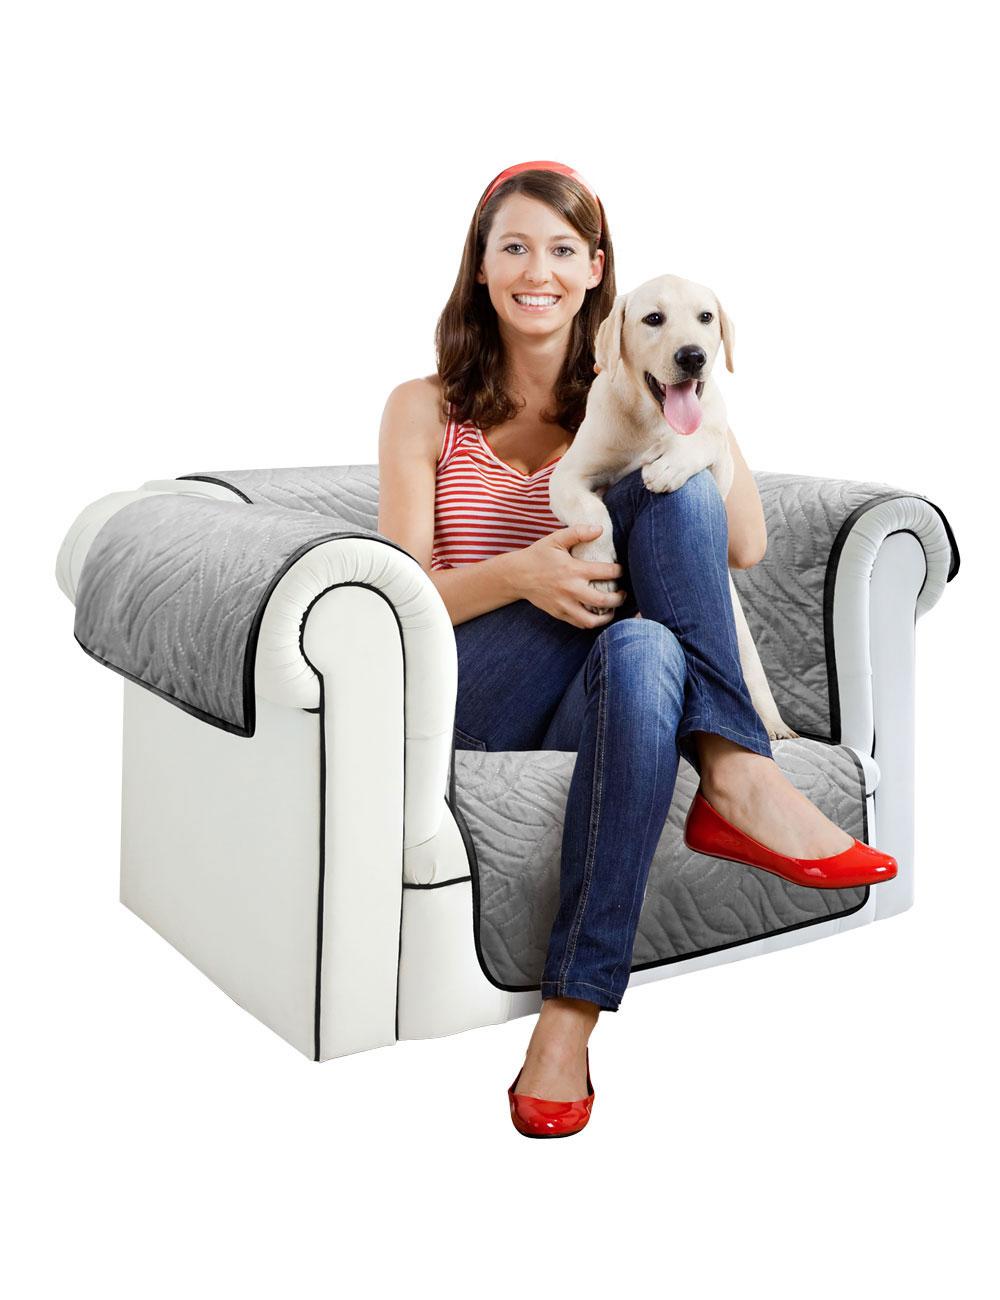 sessel berzug starlyf schwarz grau b 170 cm. Black Bedroom Furniture Sets. Home Design Ideas